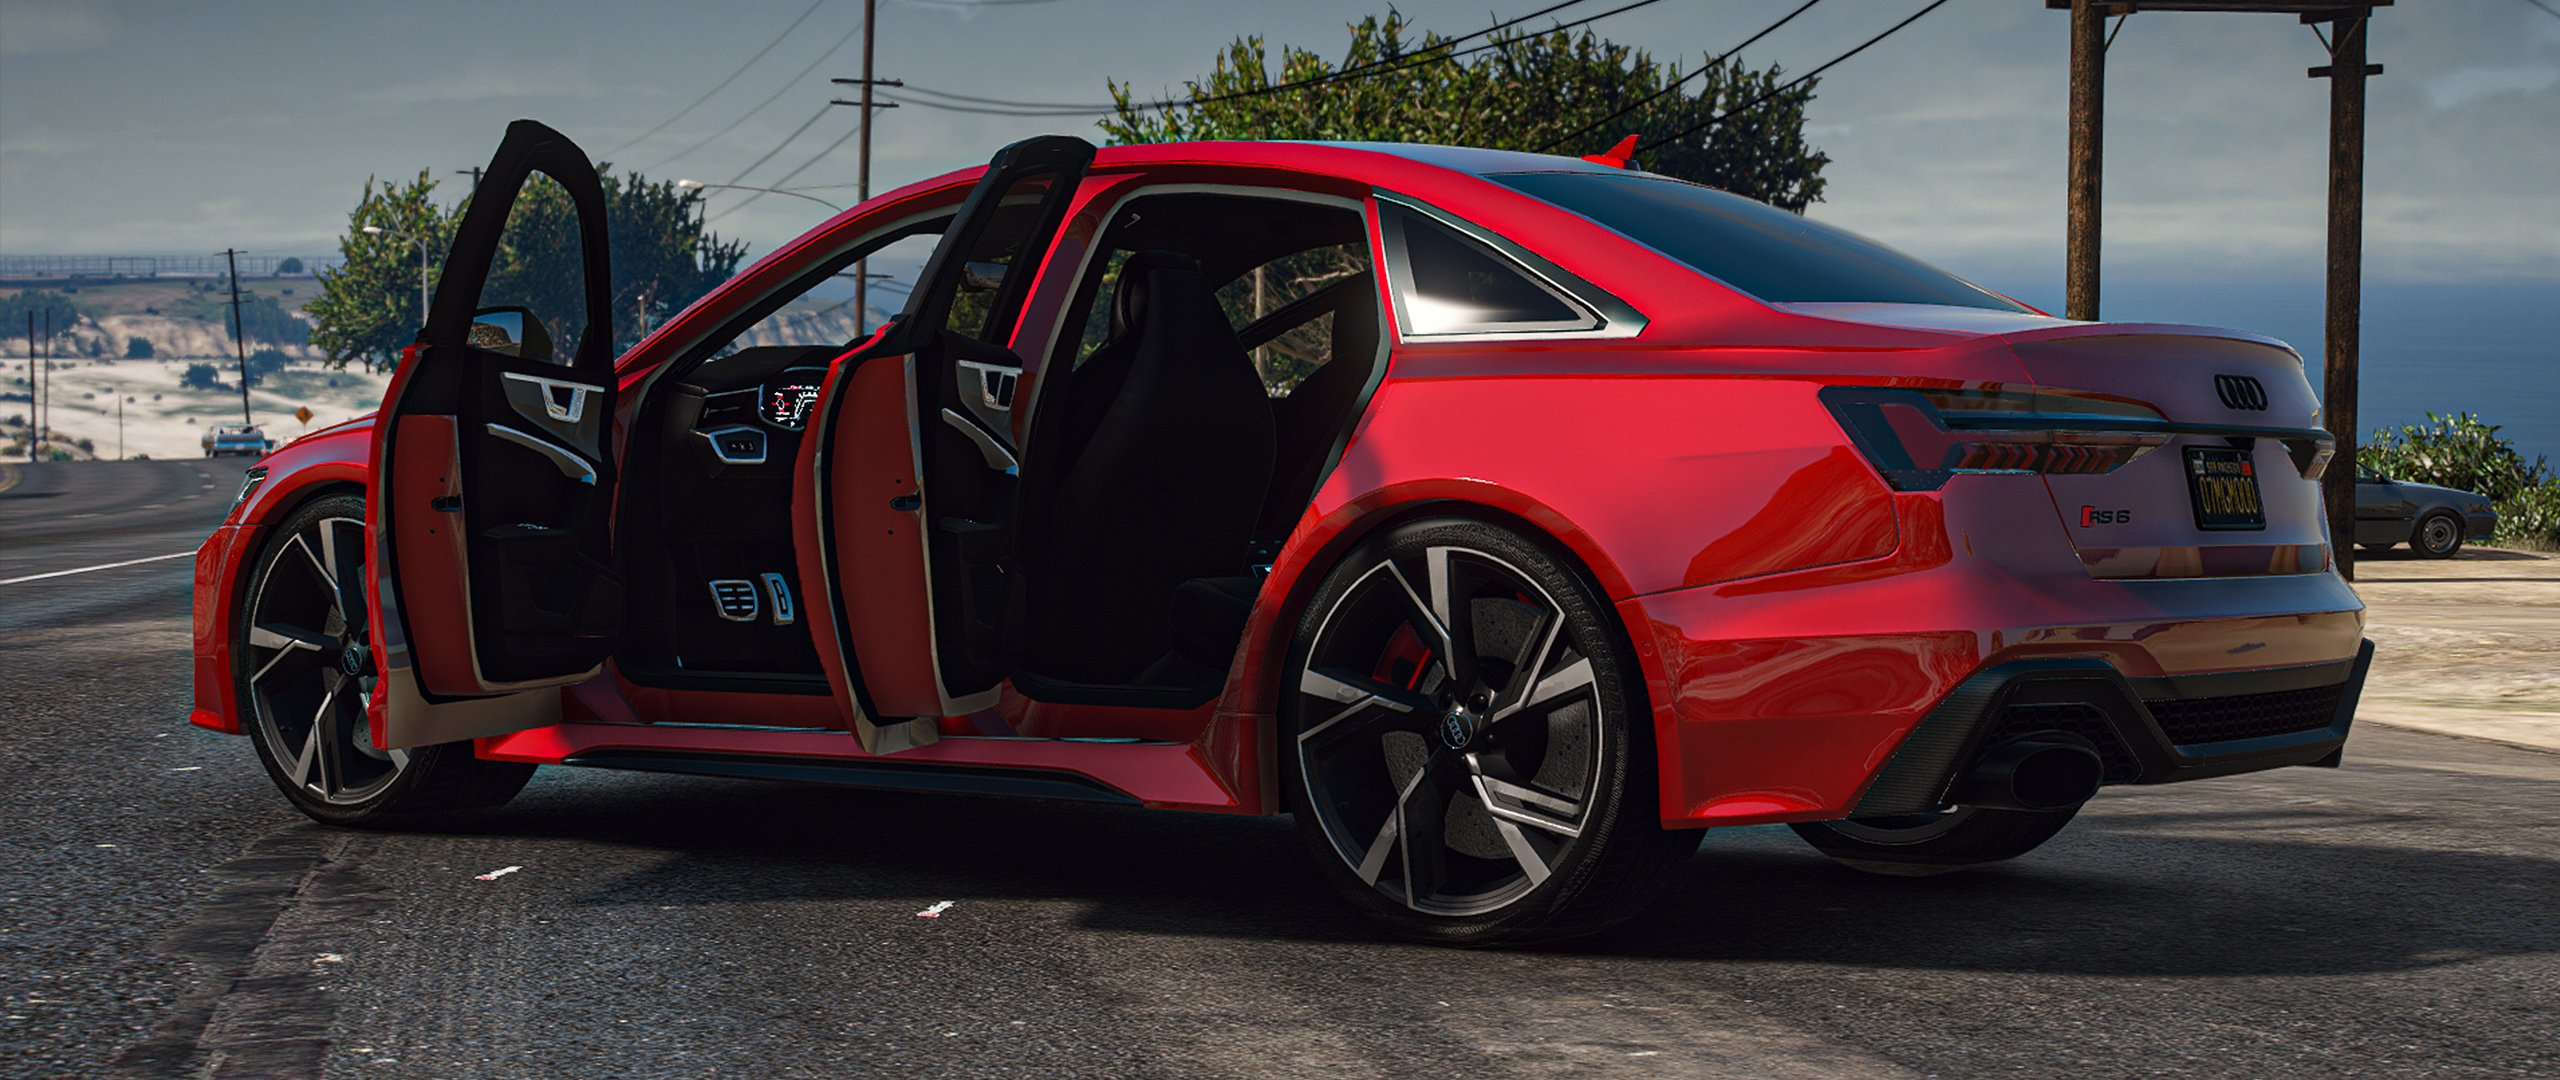 2021 Audi RS6 Sedan (C8) Add-On - GTA5-Mods.com